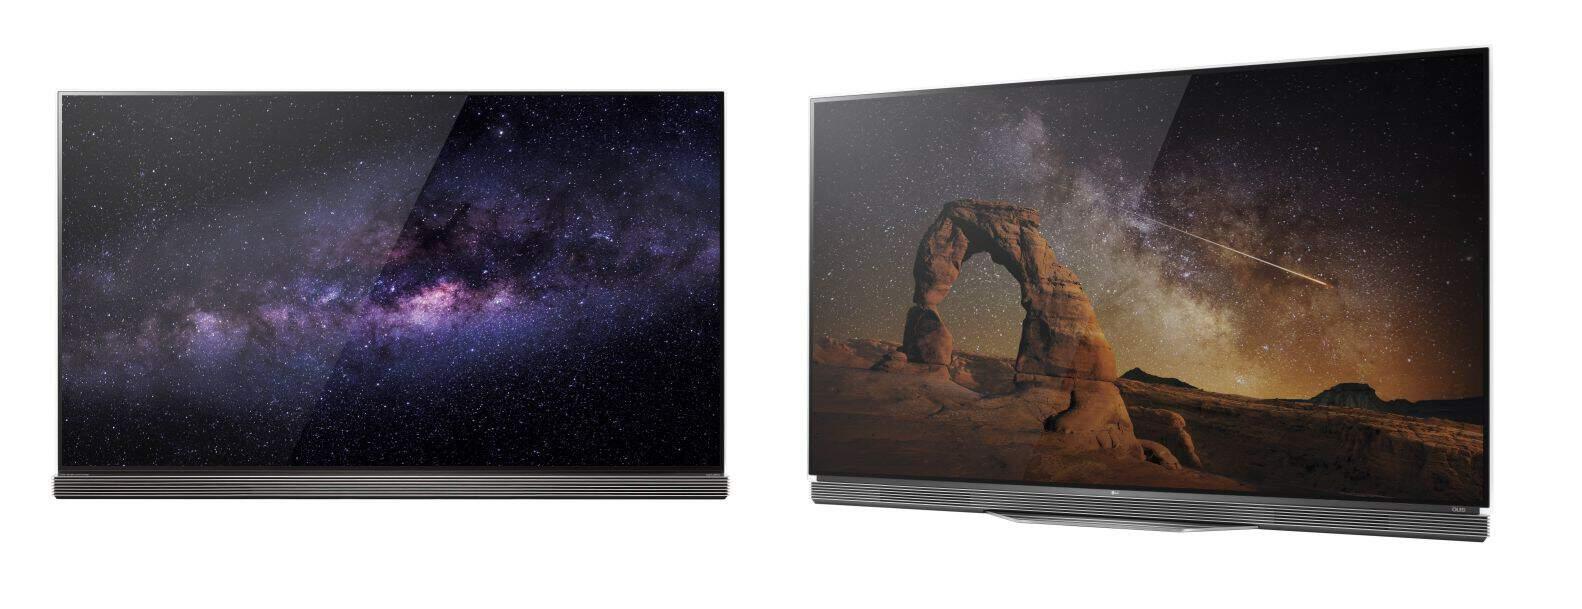 OLED TV _E6+G6